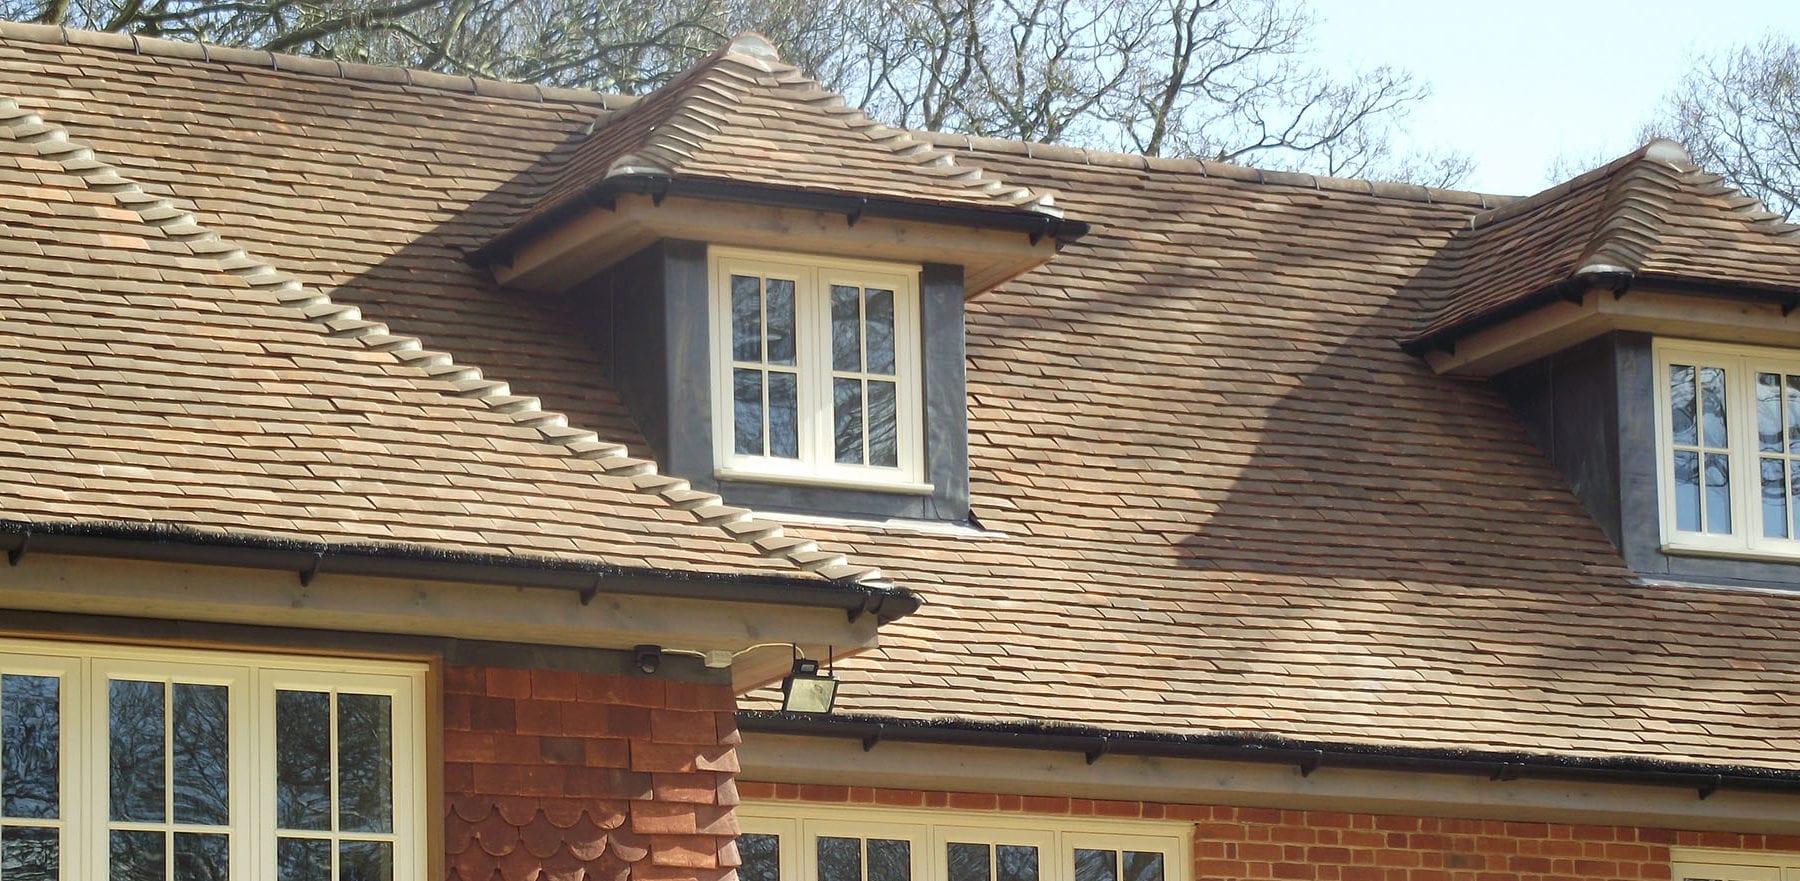 Lifestiles - Handmade Brown Clay Roof Tiles - Romsey, England 3